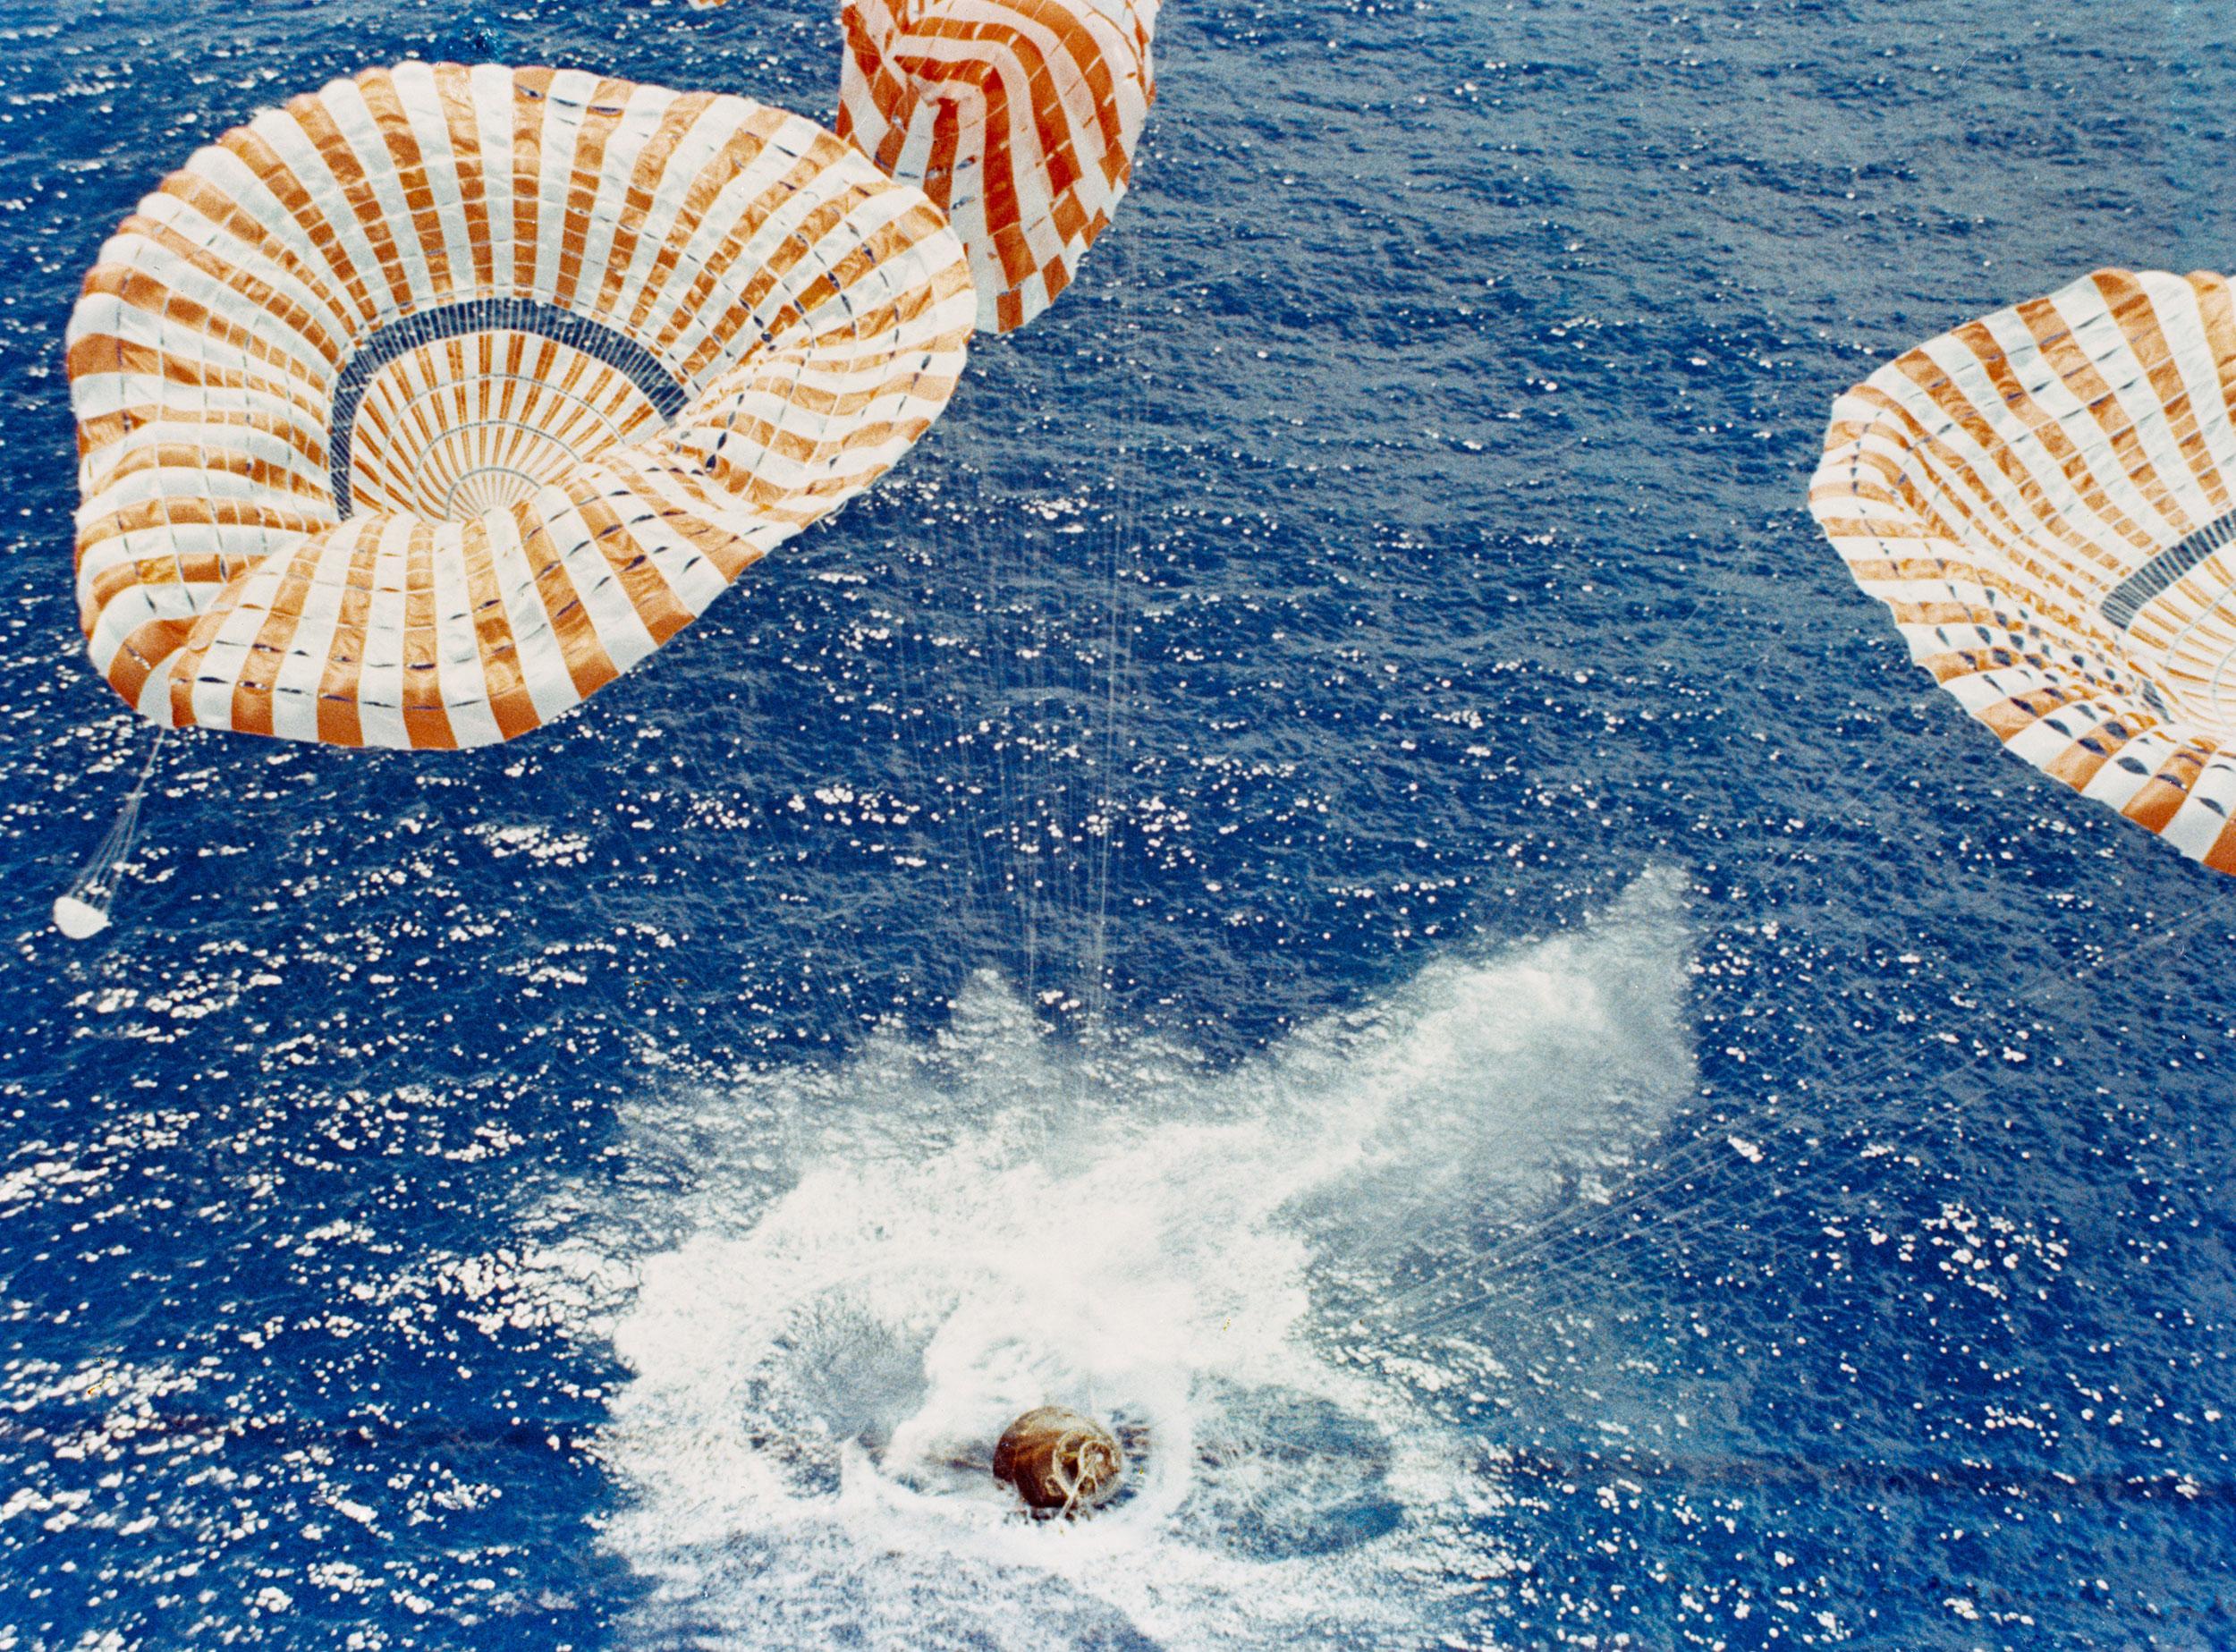 parachute module moon landing - photo #14